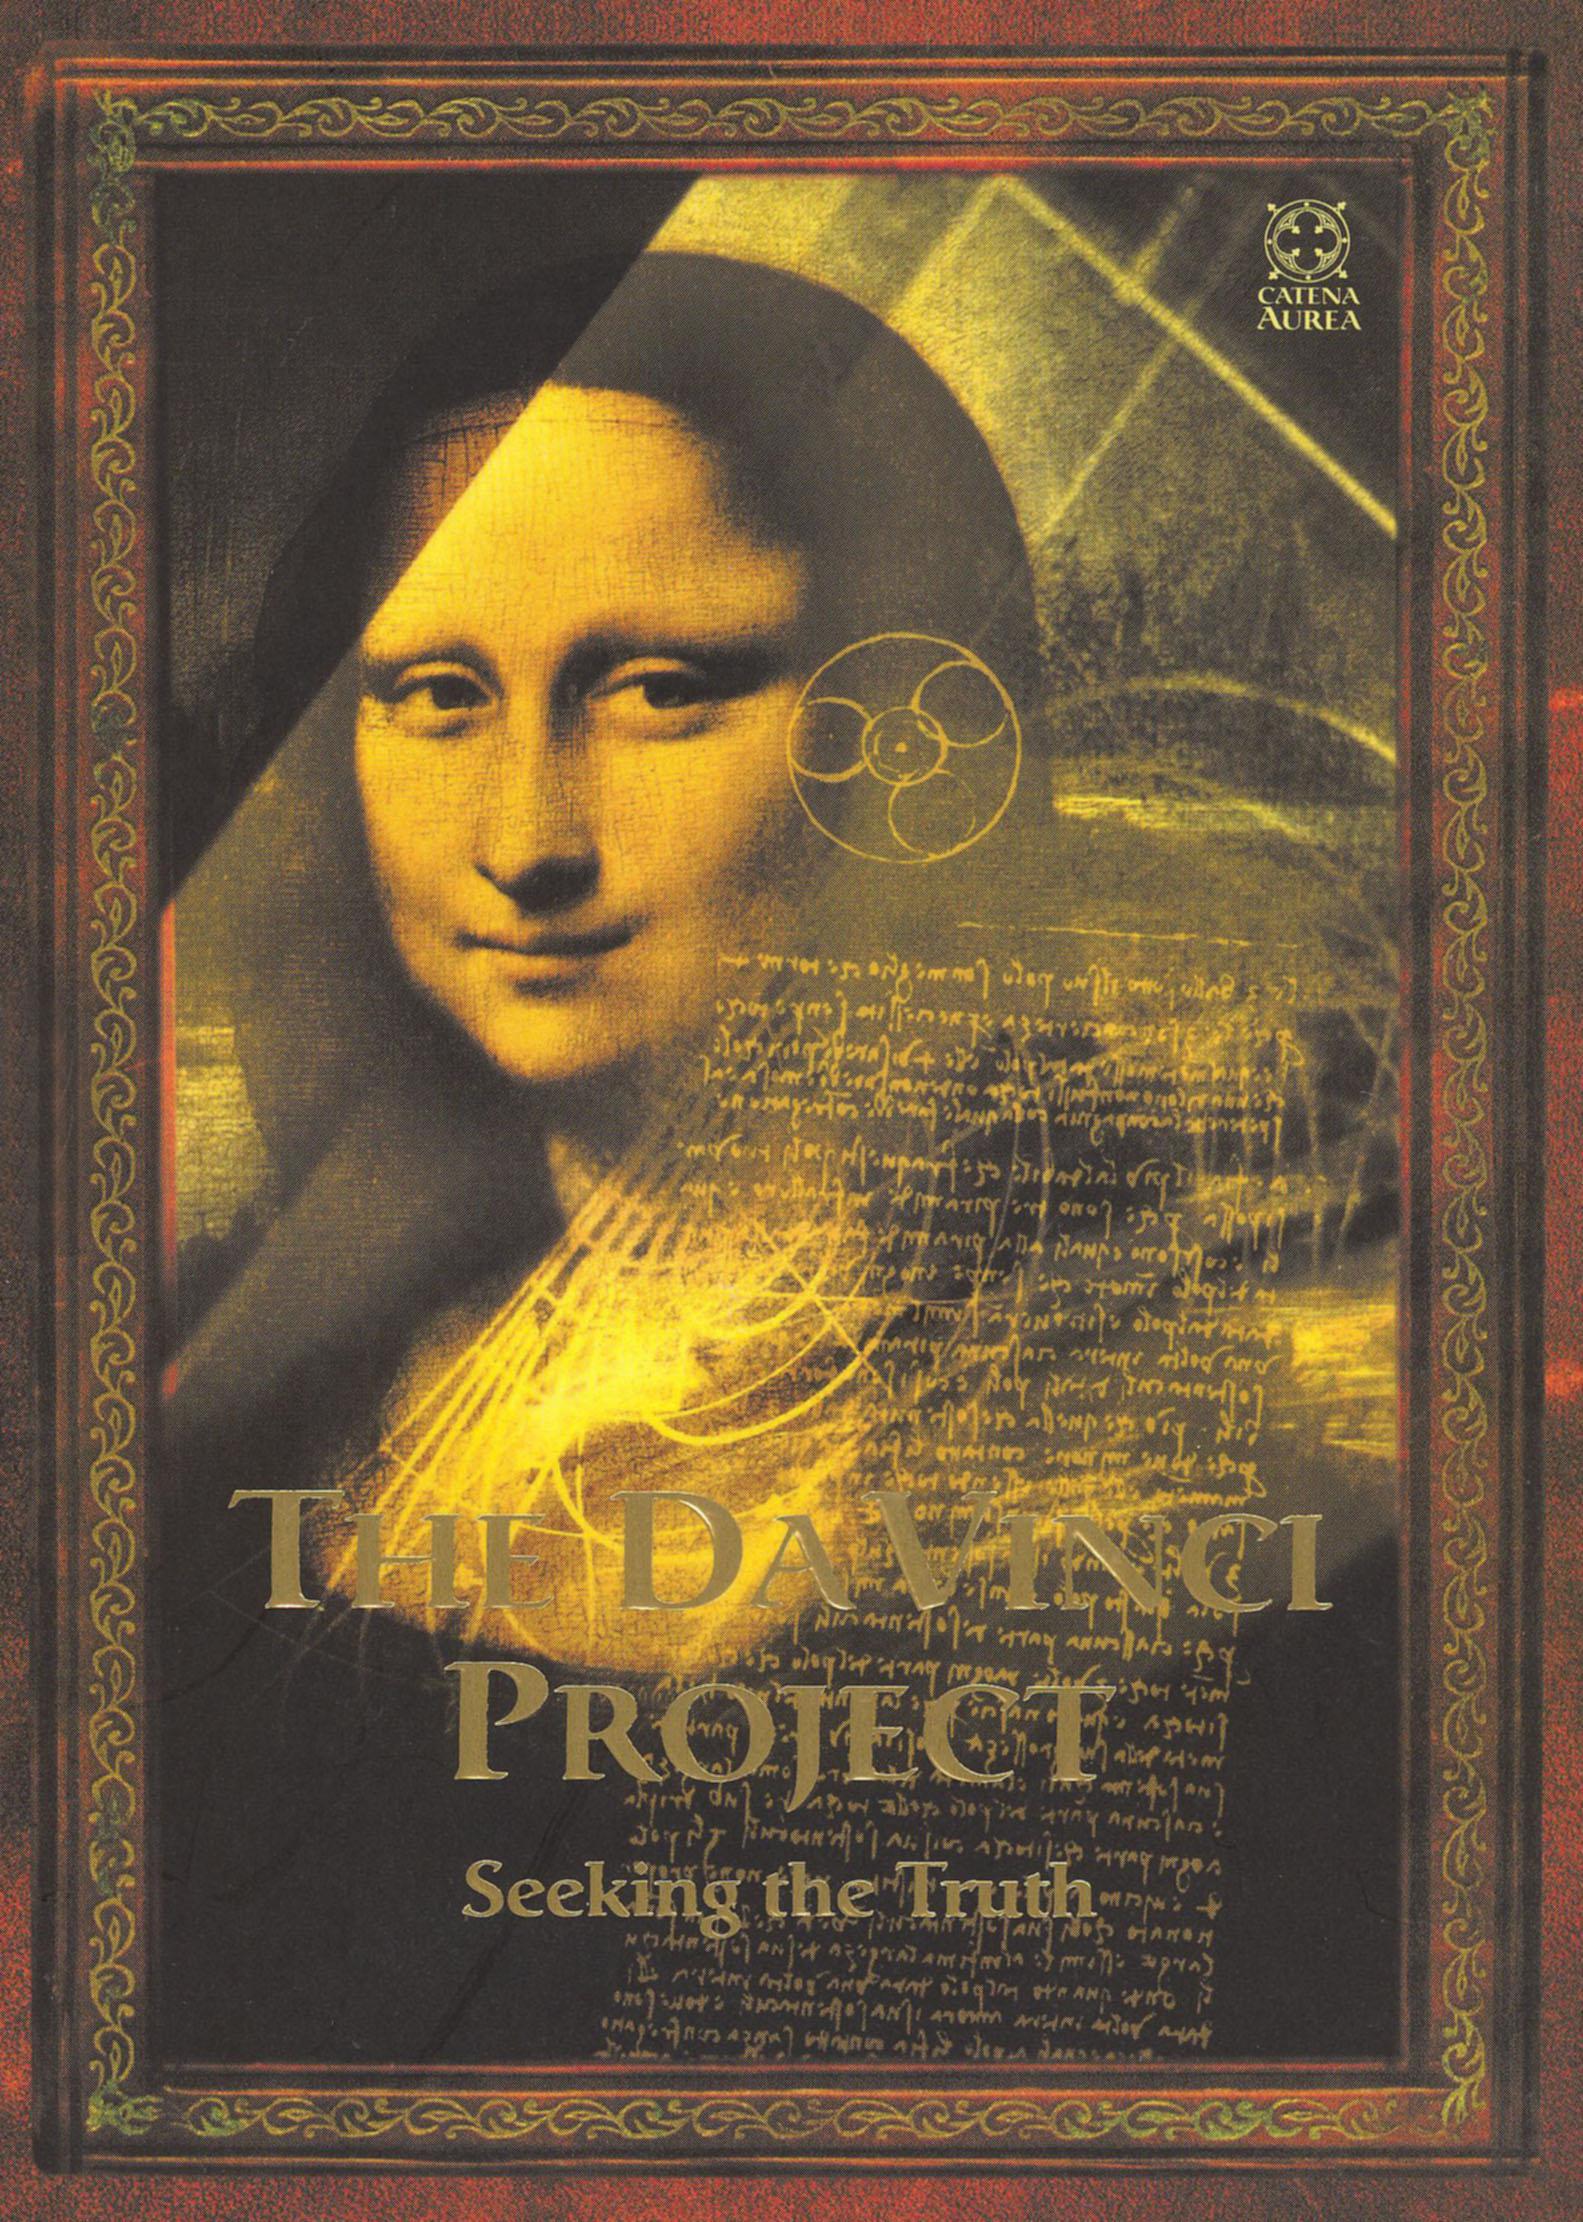 The Da Vinci Project: Seeking the Truth